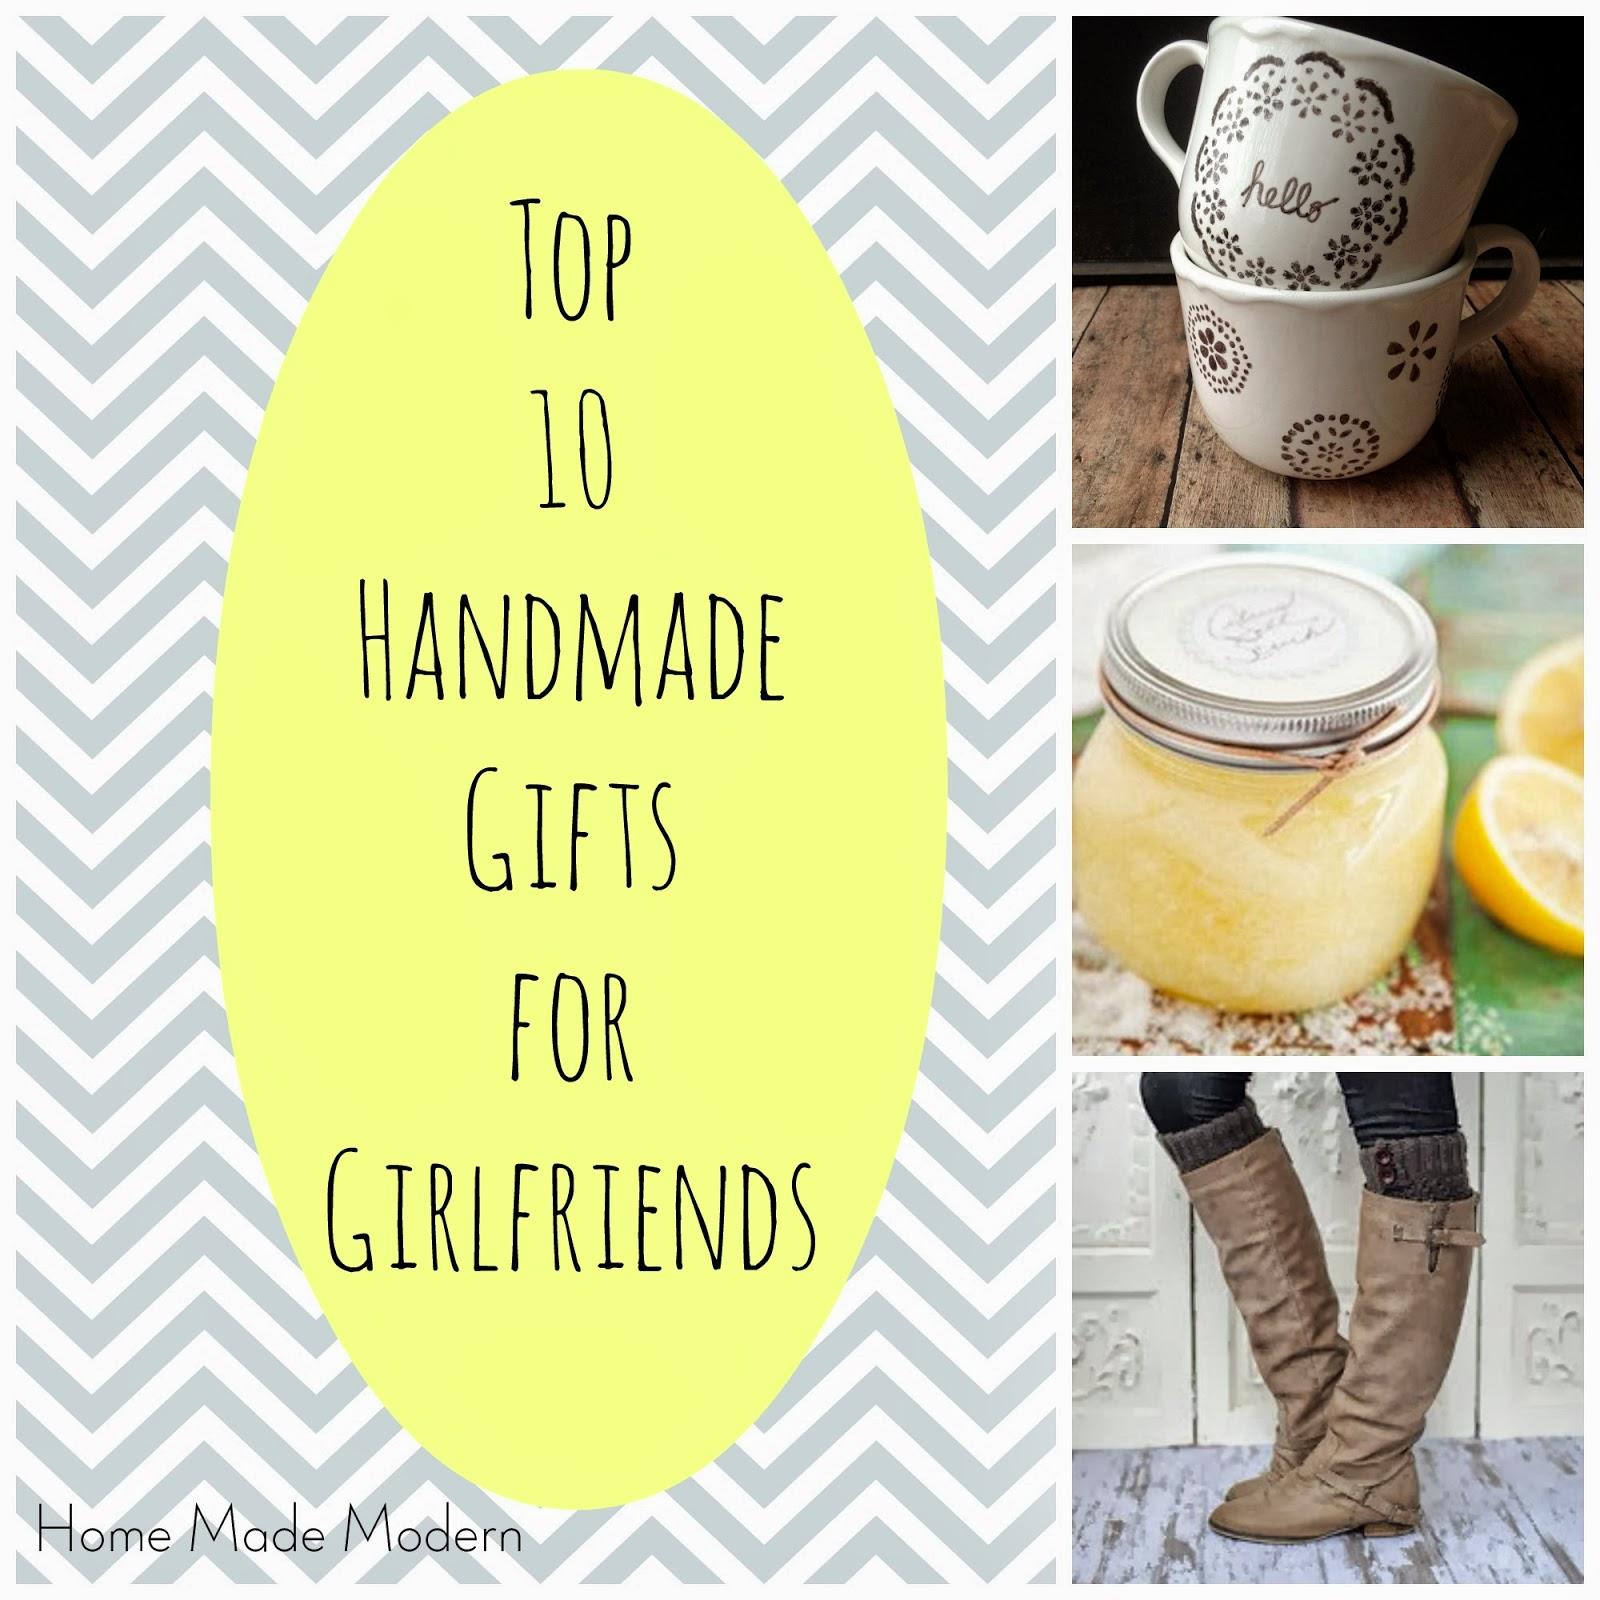 Home Made Modern: Craft of the Week: Top 10 Handmade Gifts ...